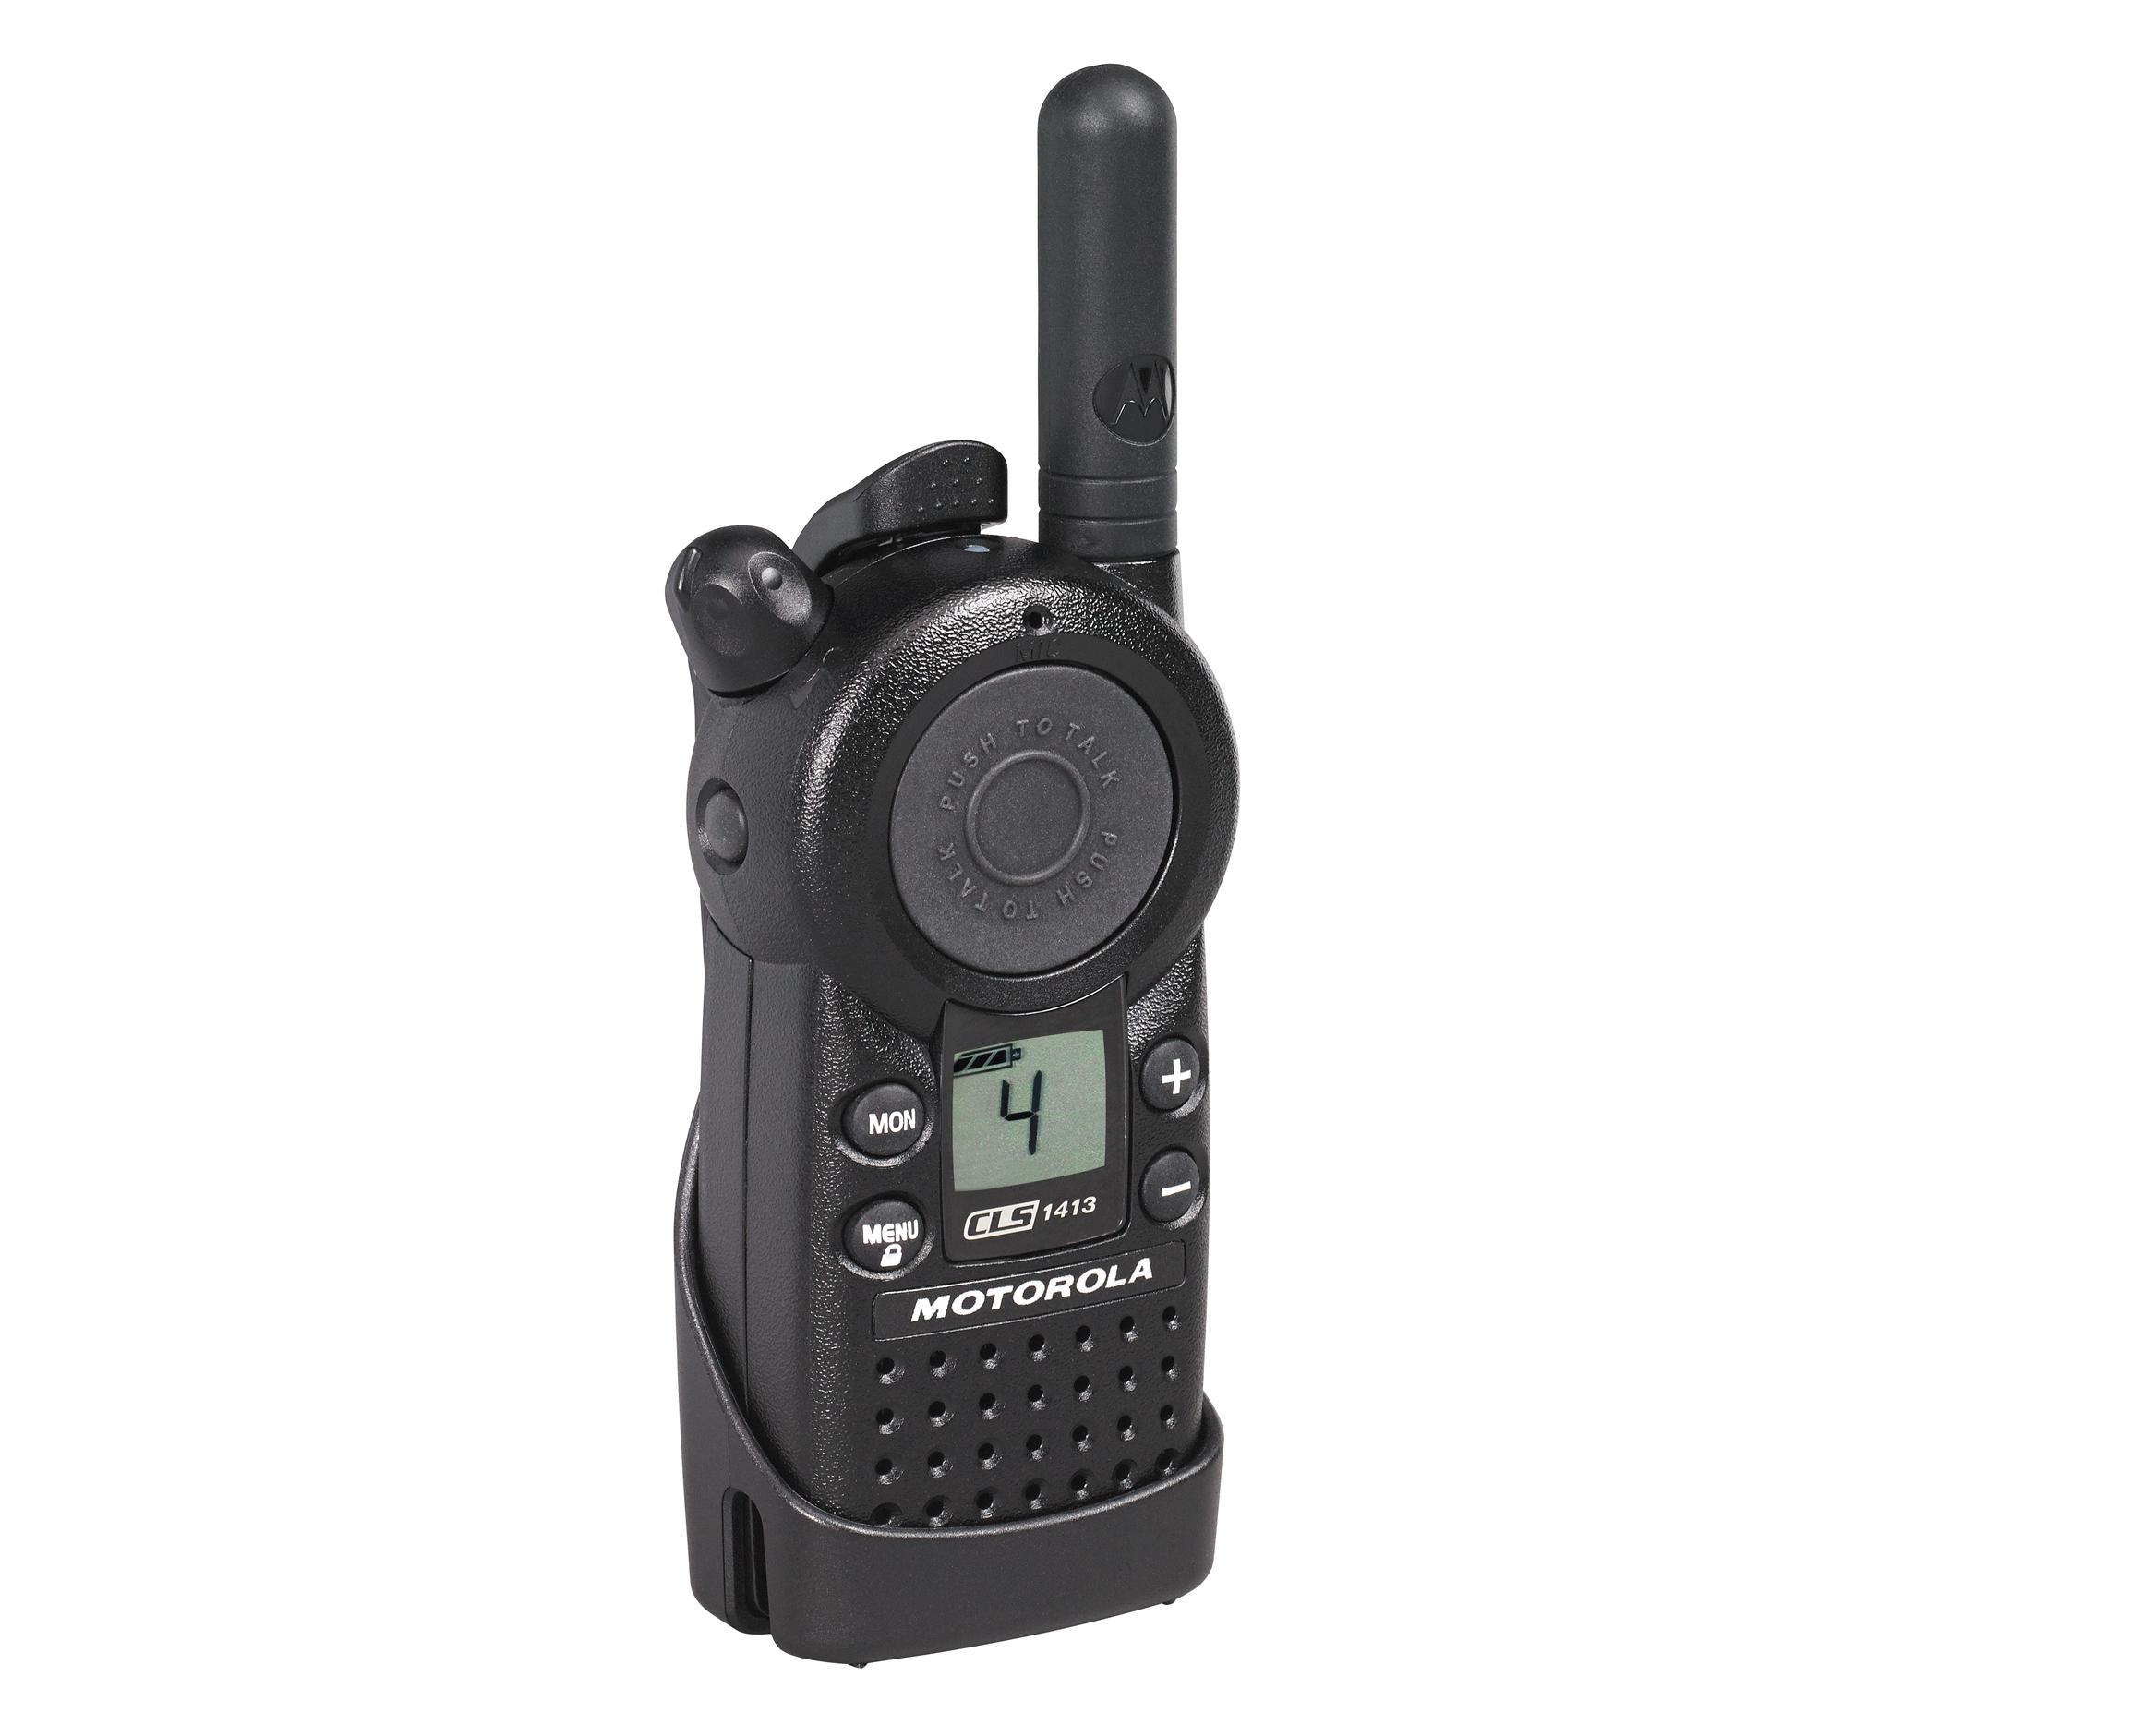 motorola two way radios. motorola two way radios ontario